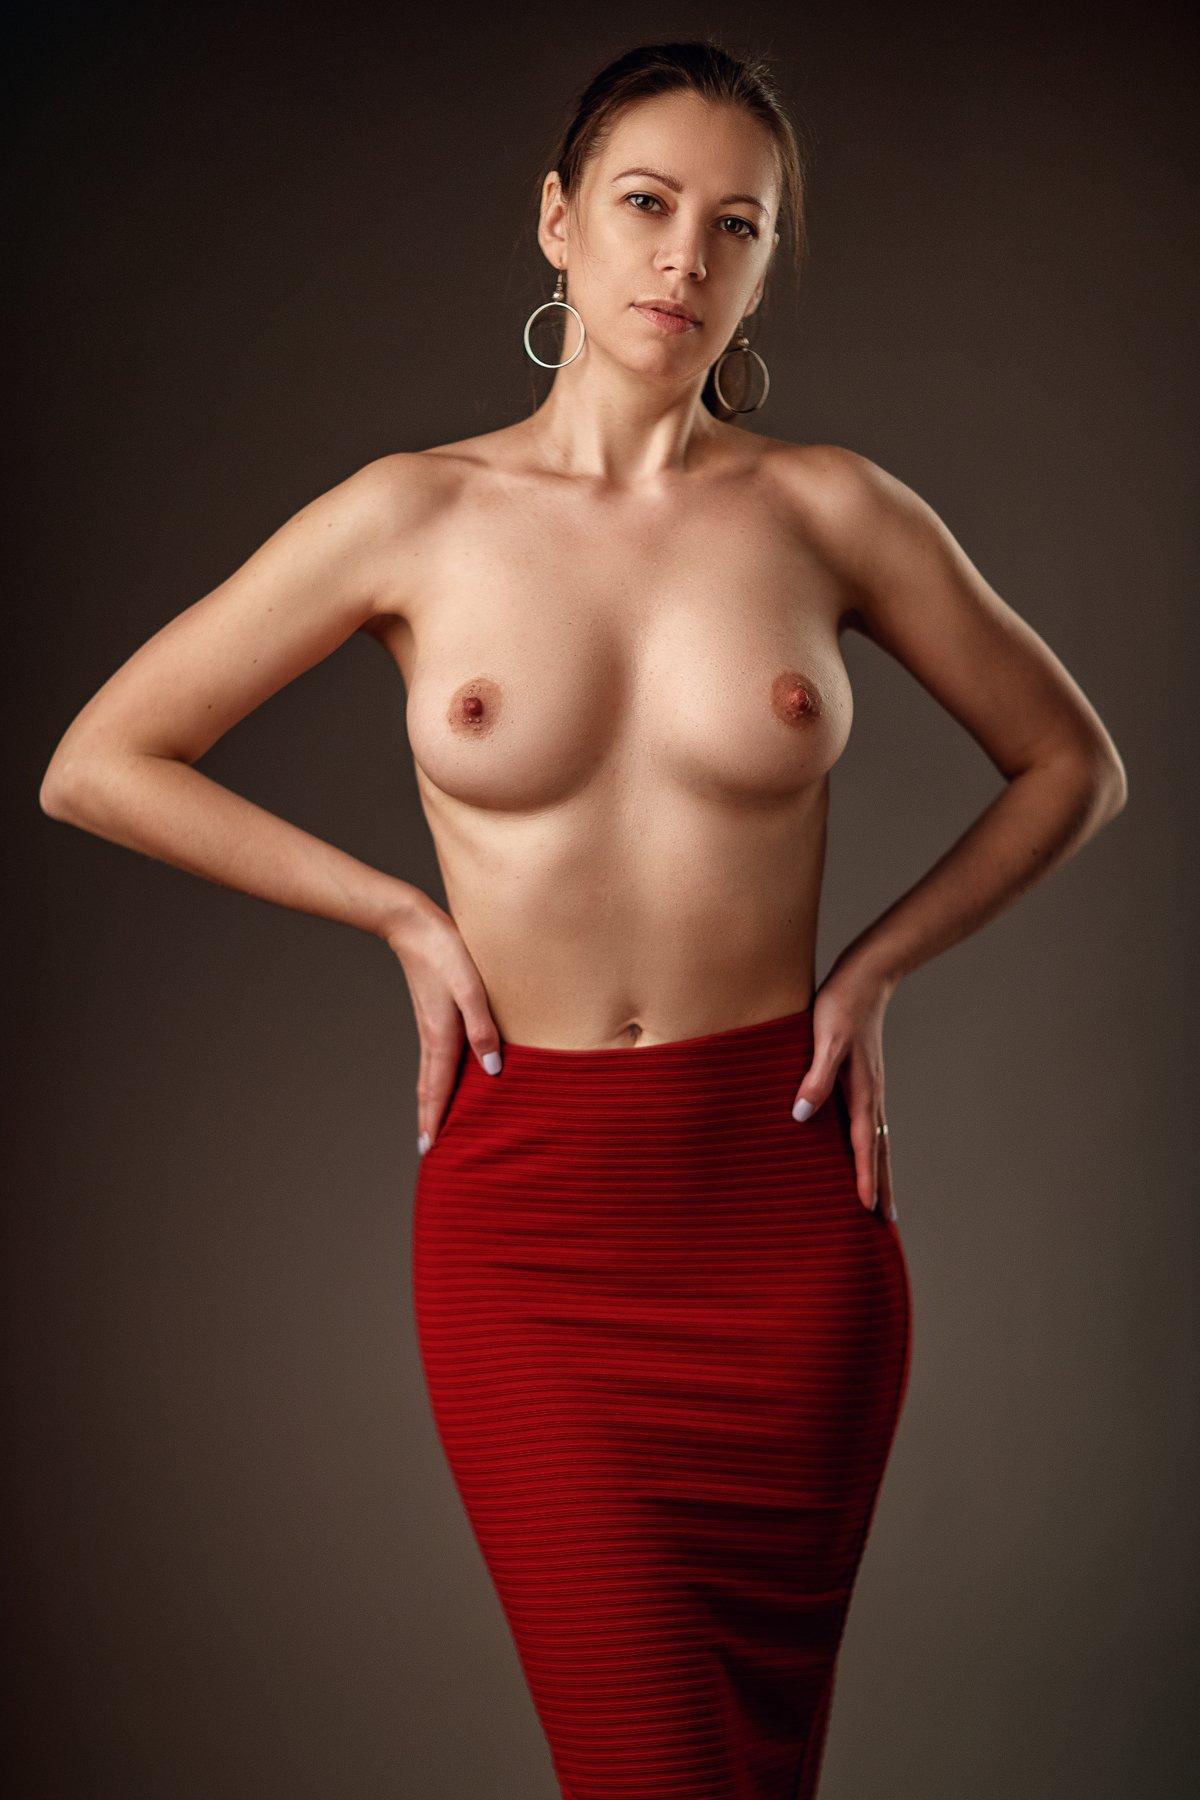 Nude, girl, body, Сергей Сорокин